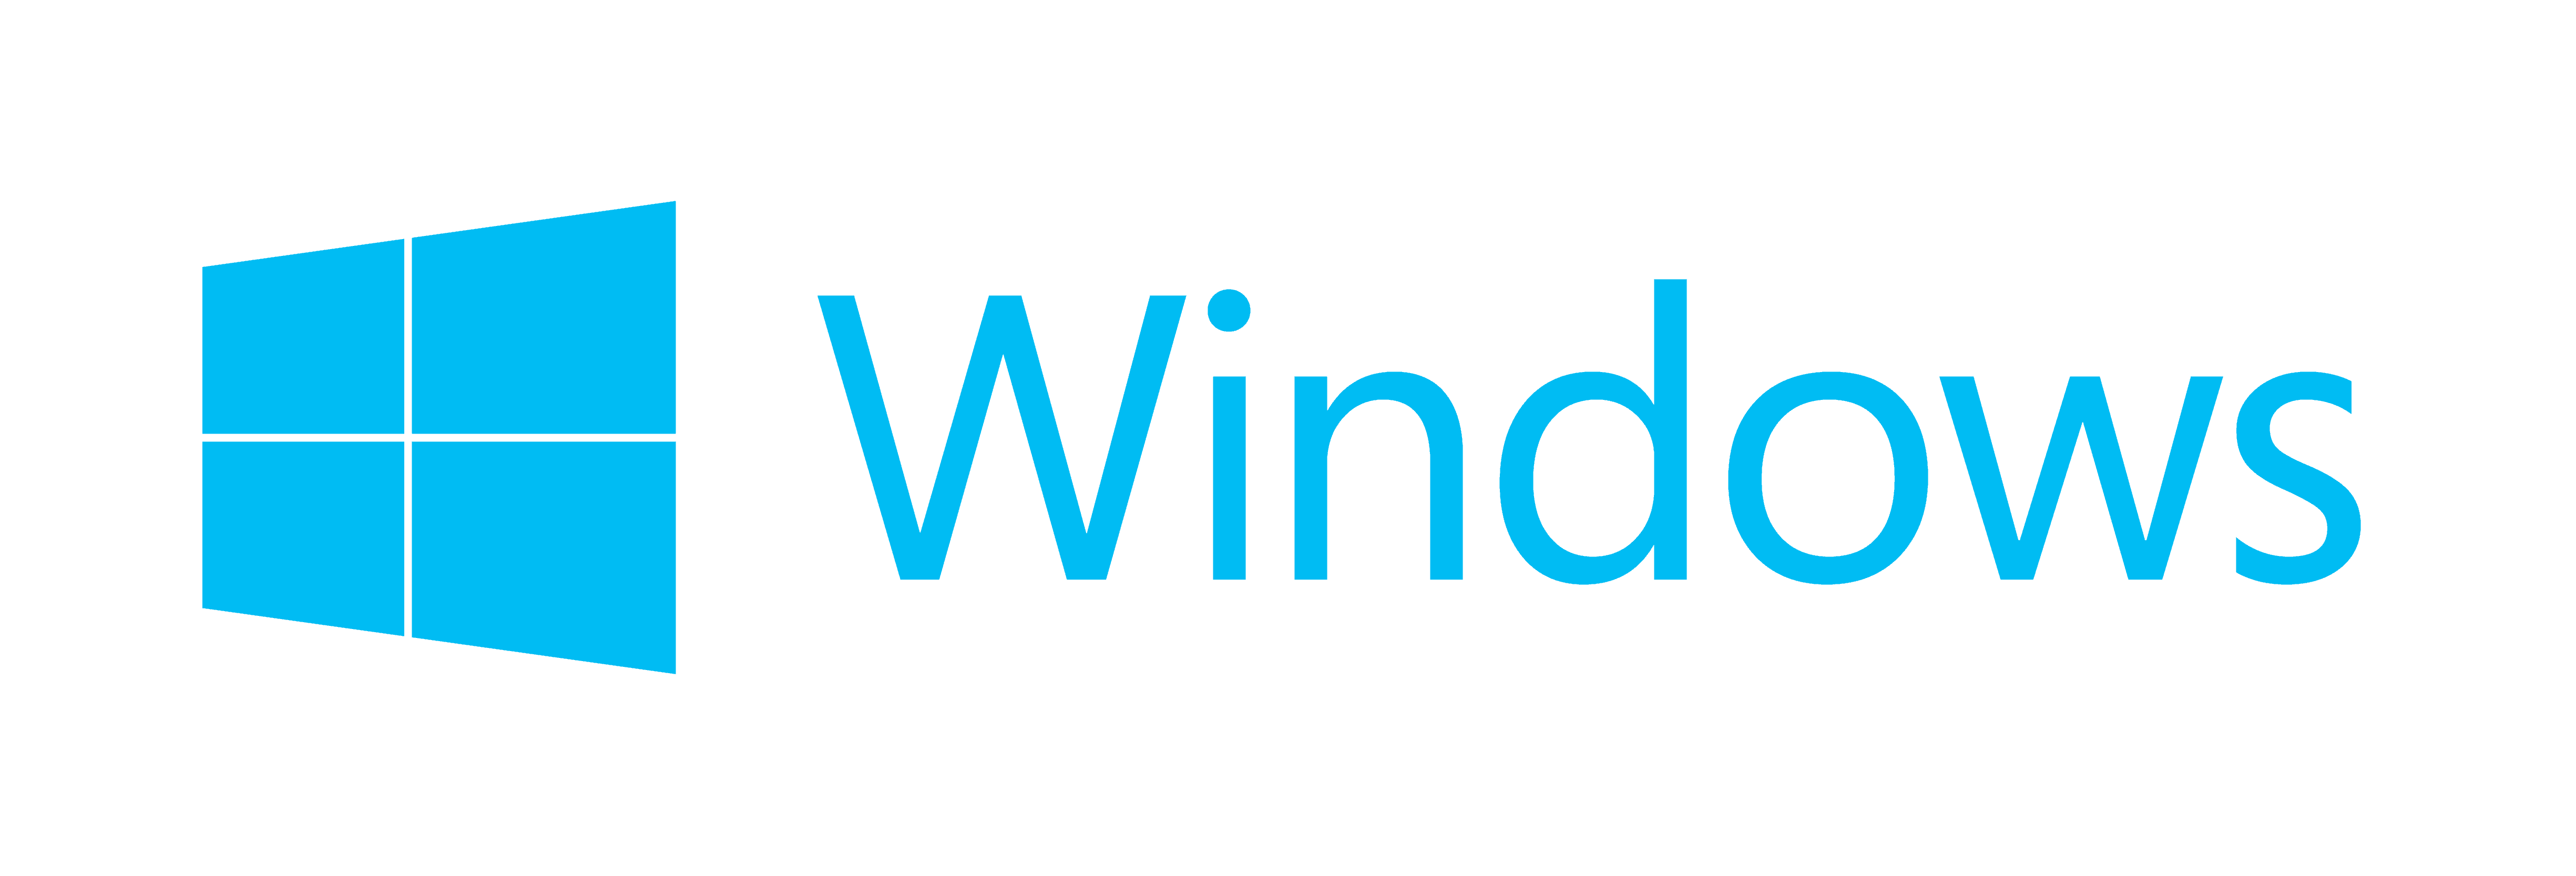 Free Microsoft Windows licenses